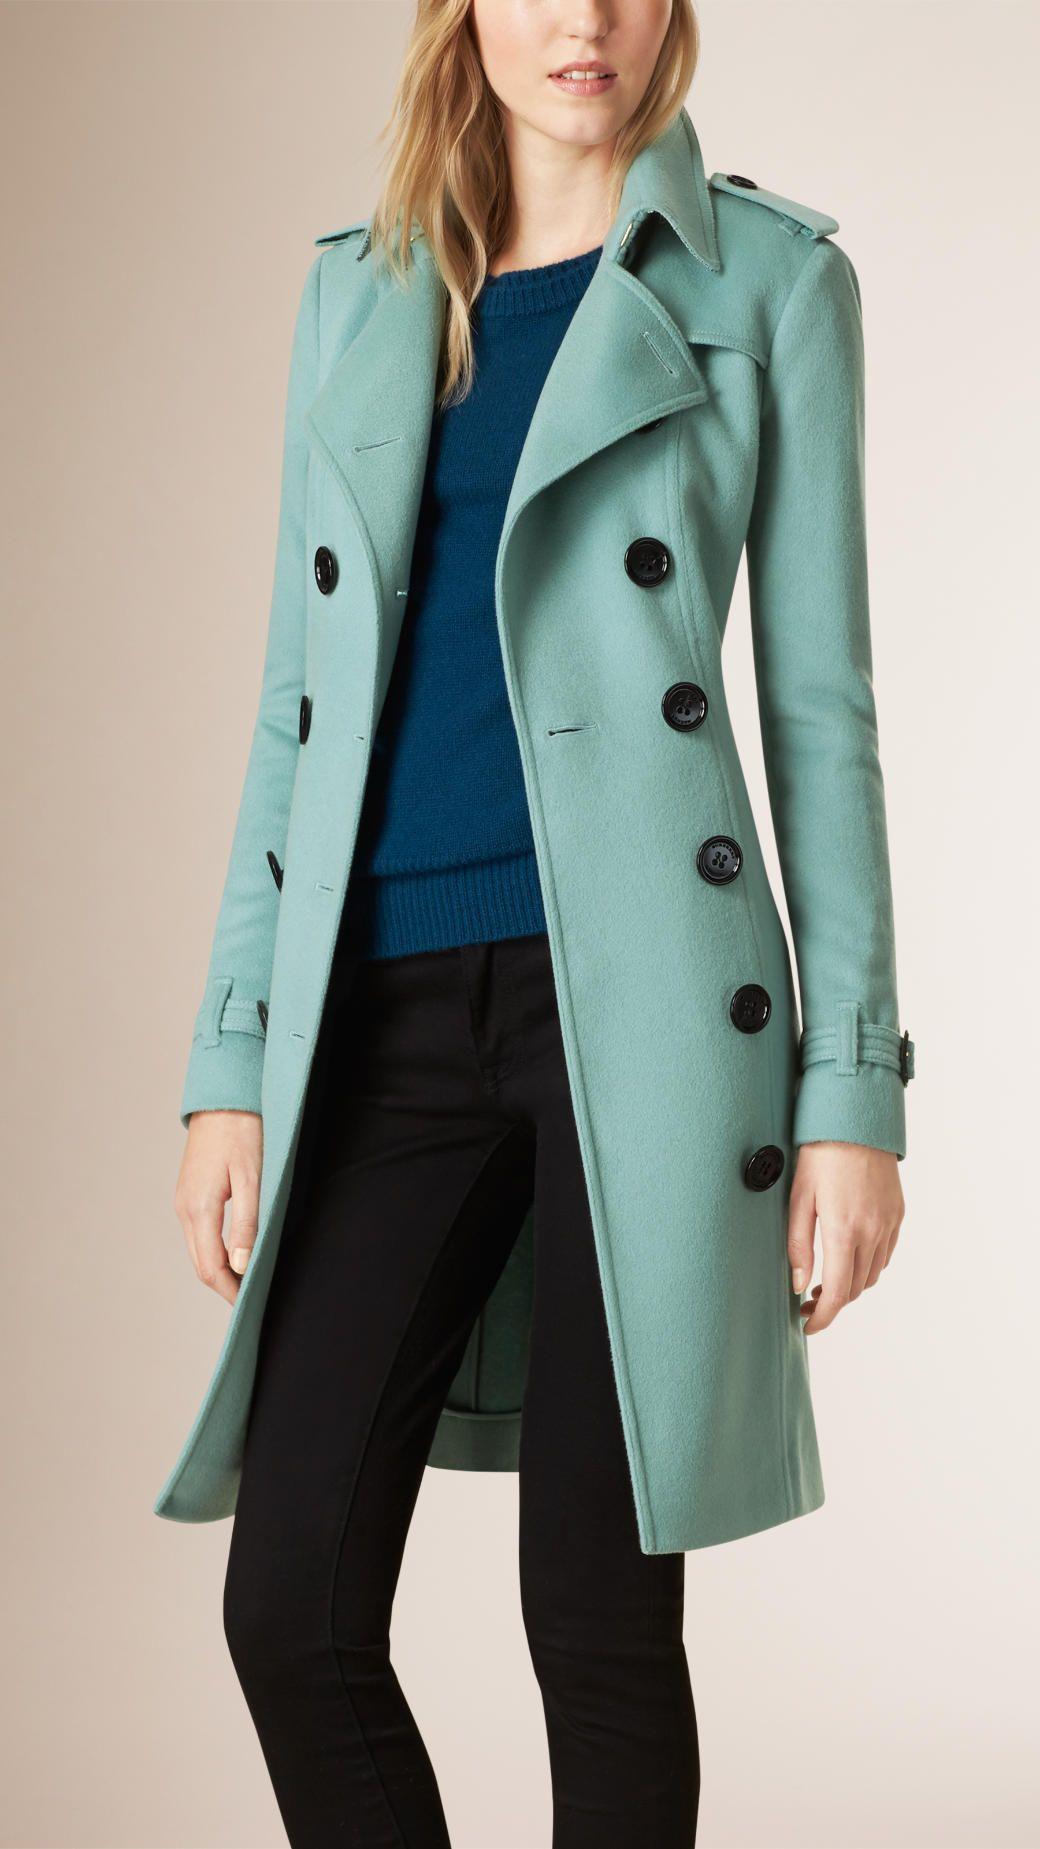 Sandringham Fit Cashmere Trench Coat Dusty Mint | Burberry Blazers, Winter  Coat, Jacket Dress